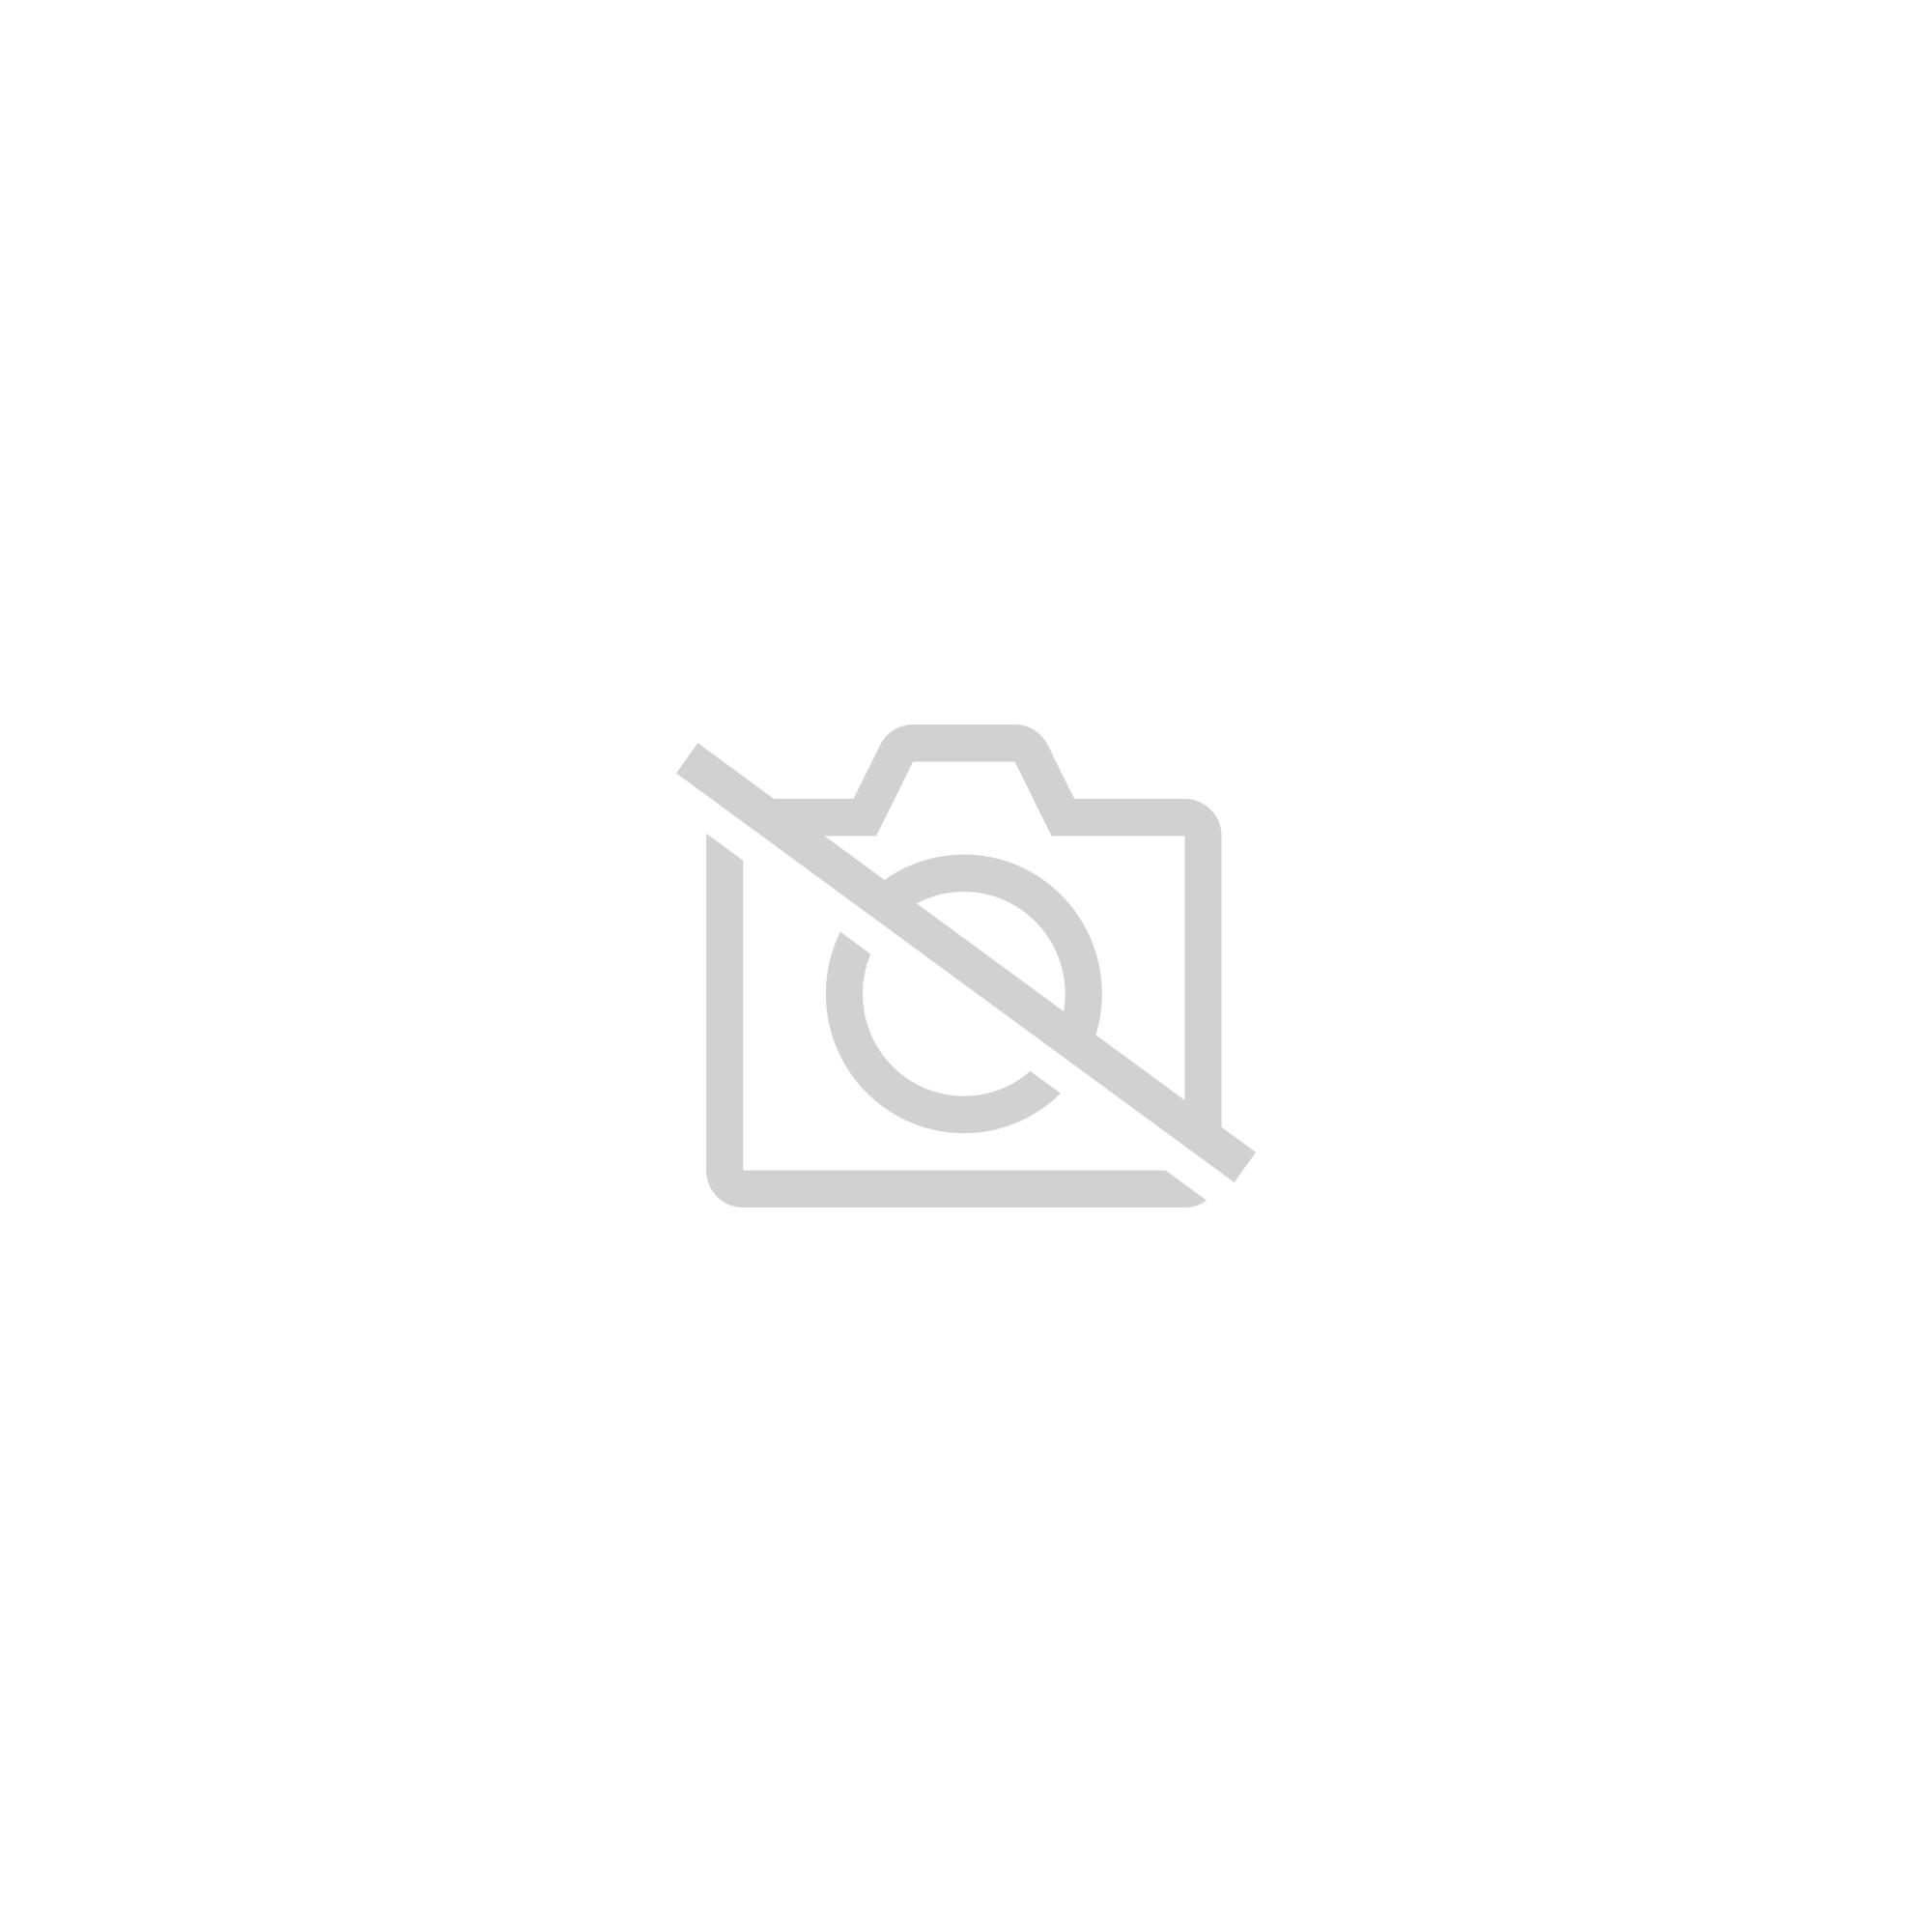 Drone Walkera F210 6 Axis Gyro Drone Quadcopter Hélicoptère Version Bnf Avec 700tvl Hd Caméra-Walkera